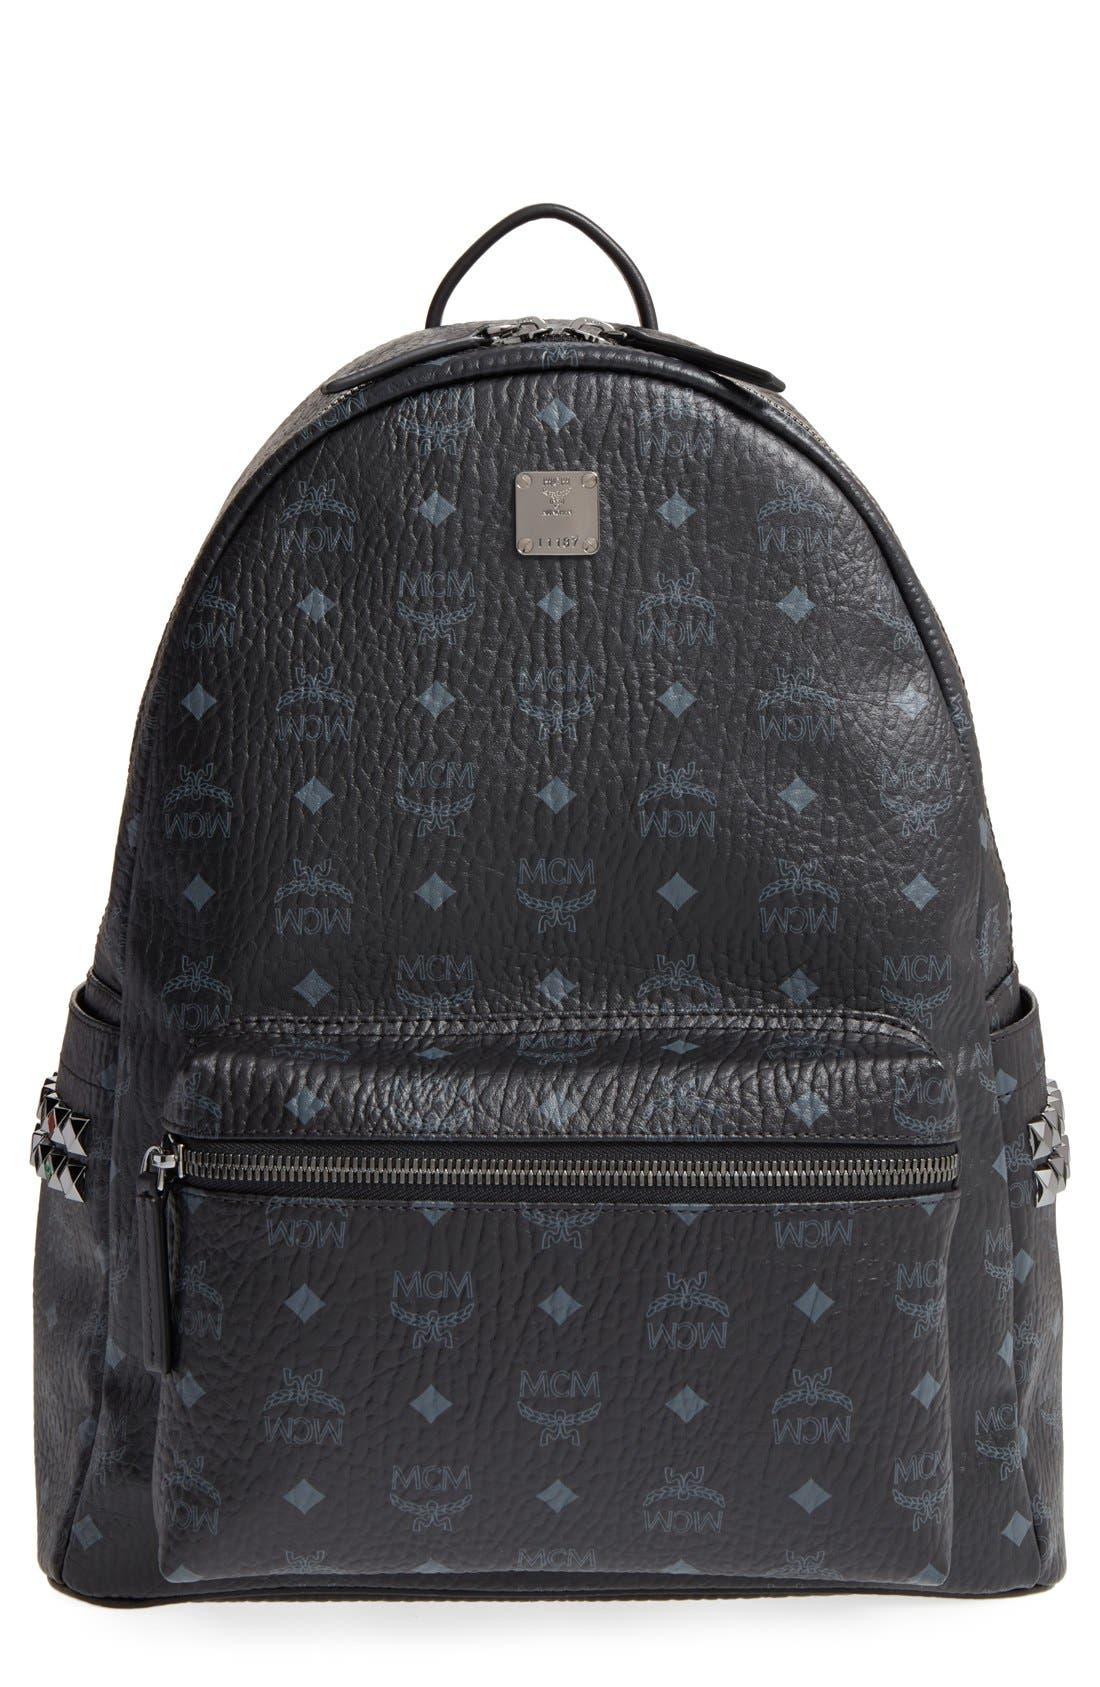 MCM, Medium Stark Visetos Coated Canvas Backpack, Main thumbnail 1, color, BLACK